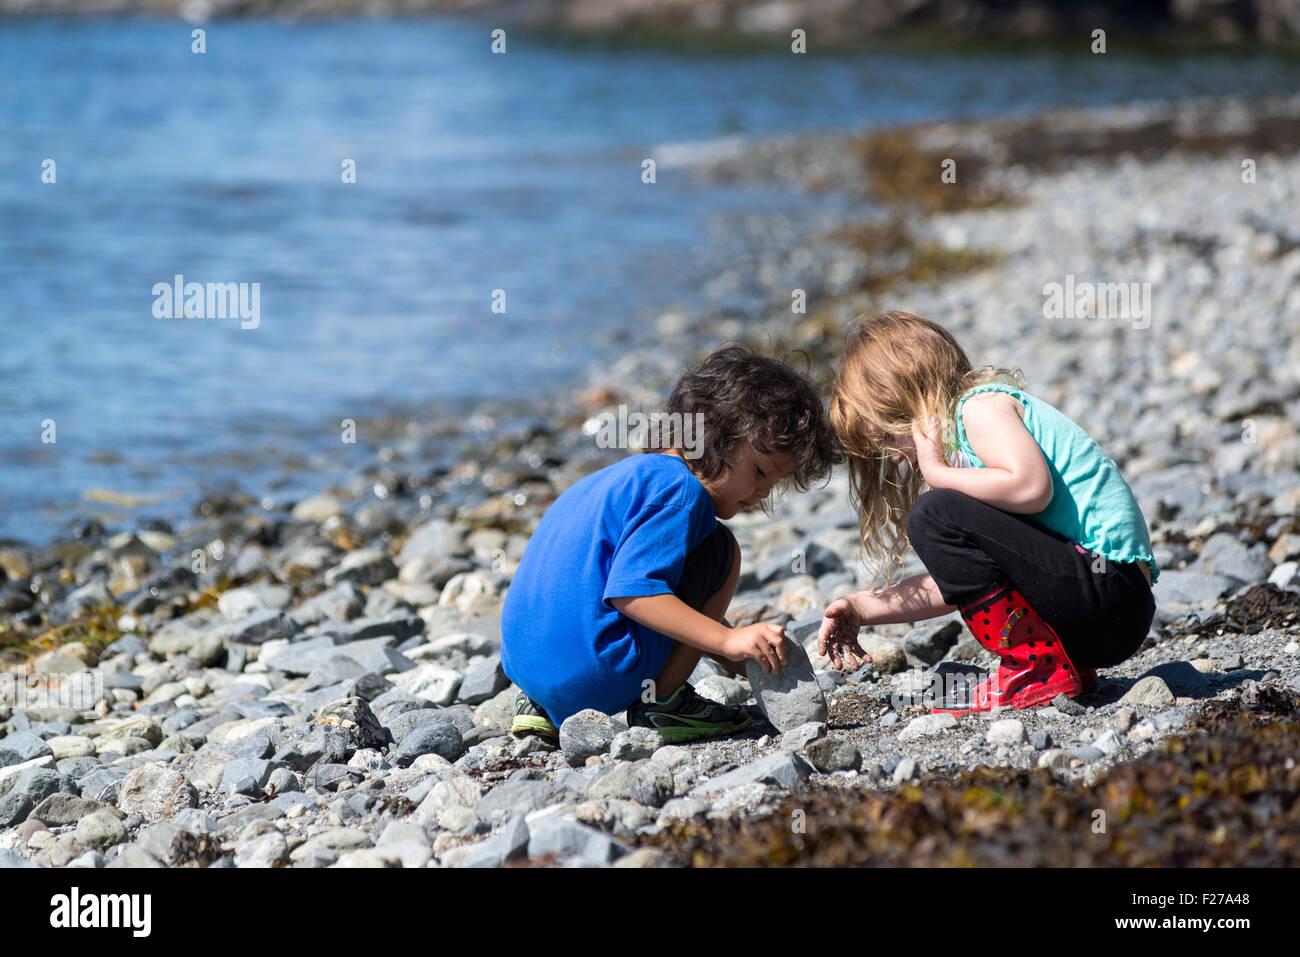 Children exploring the beach in Sitka National Historic Park, Alaska. - Stock Image